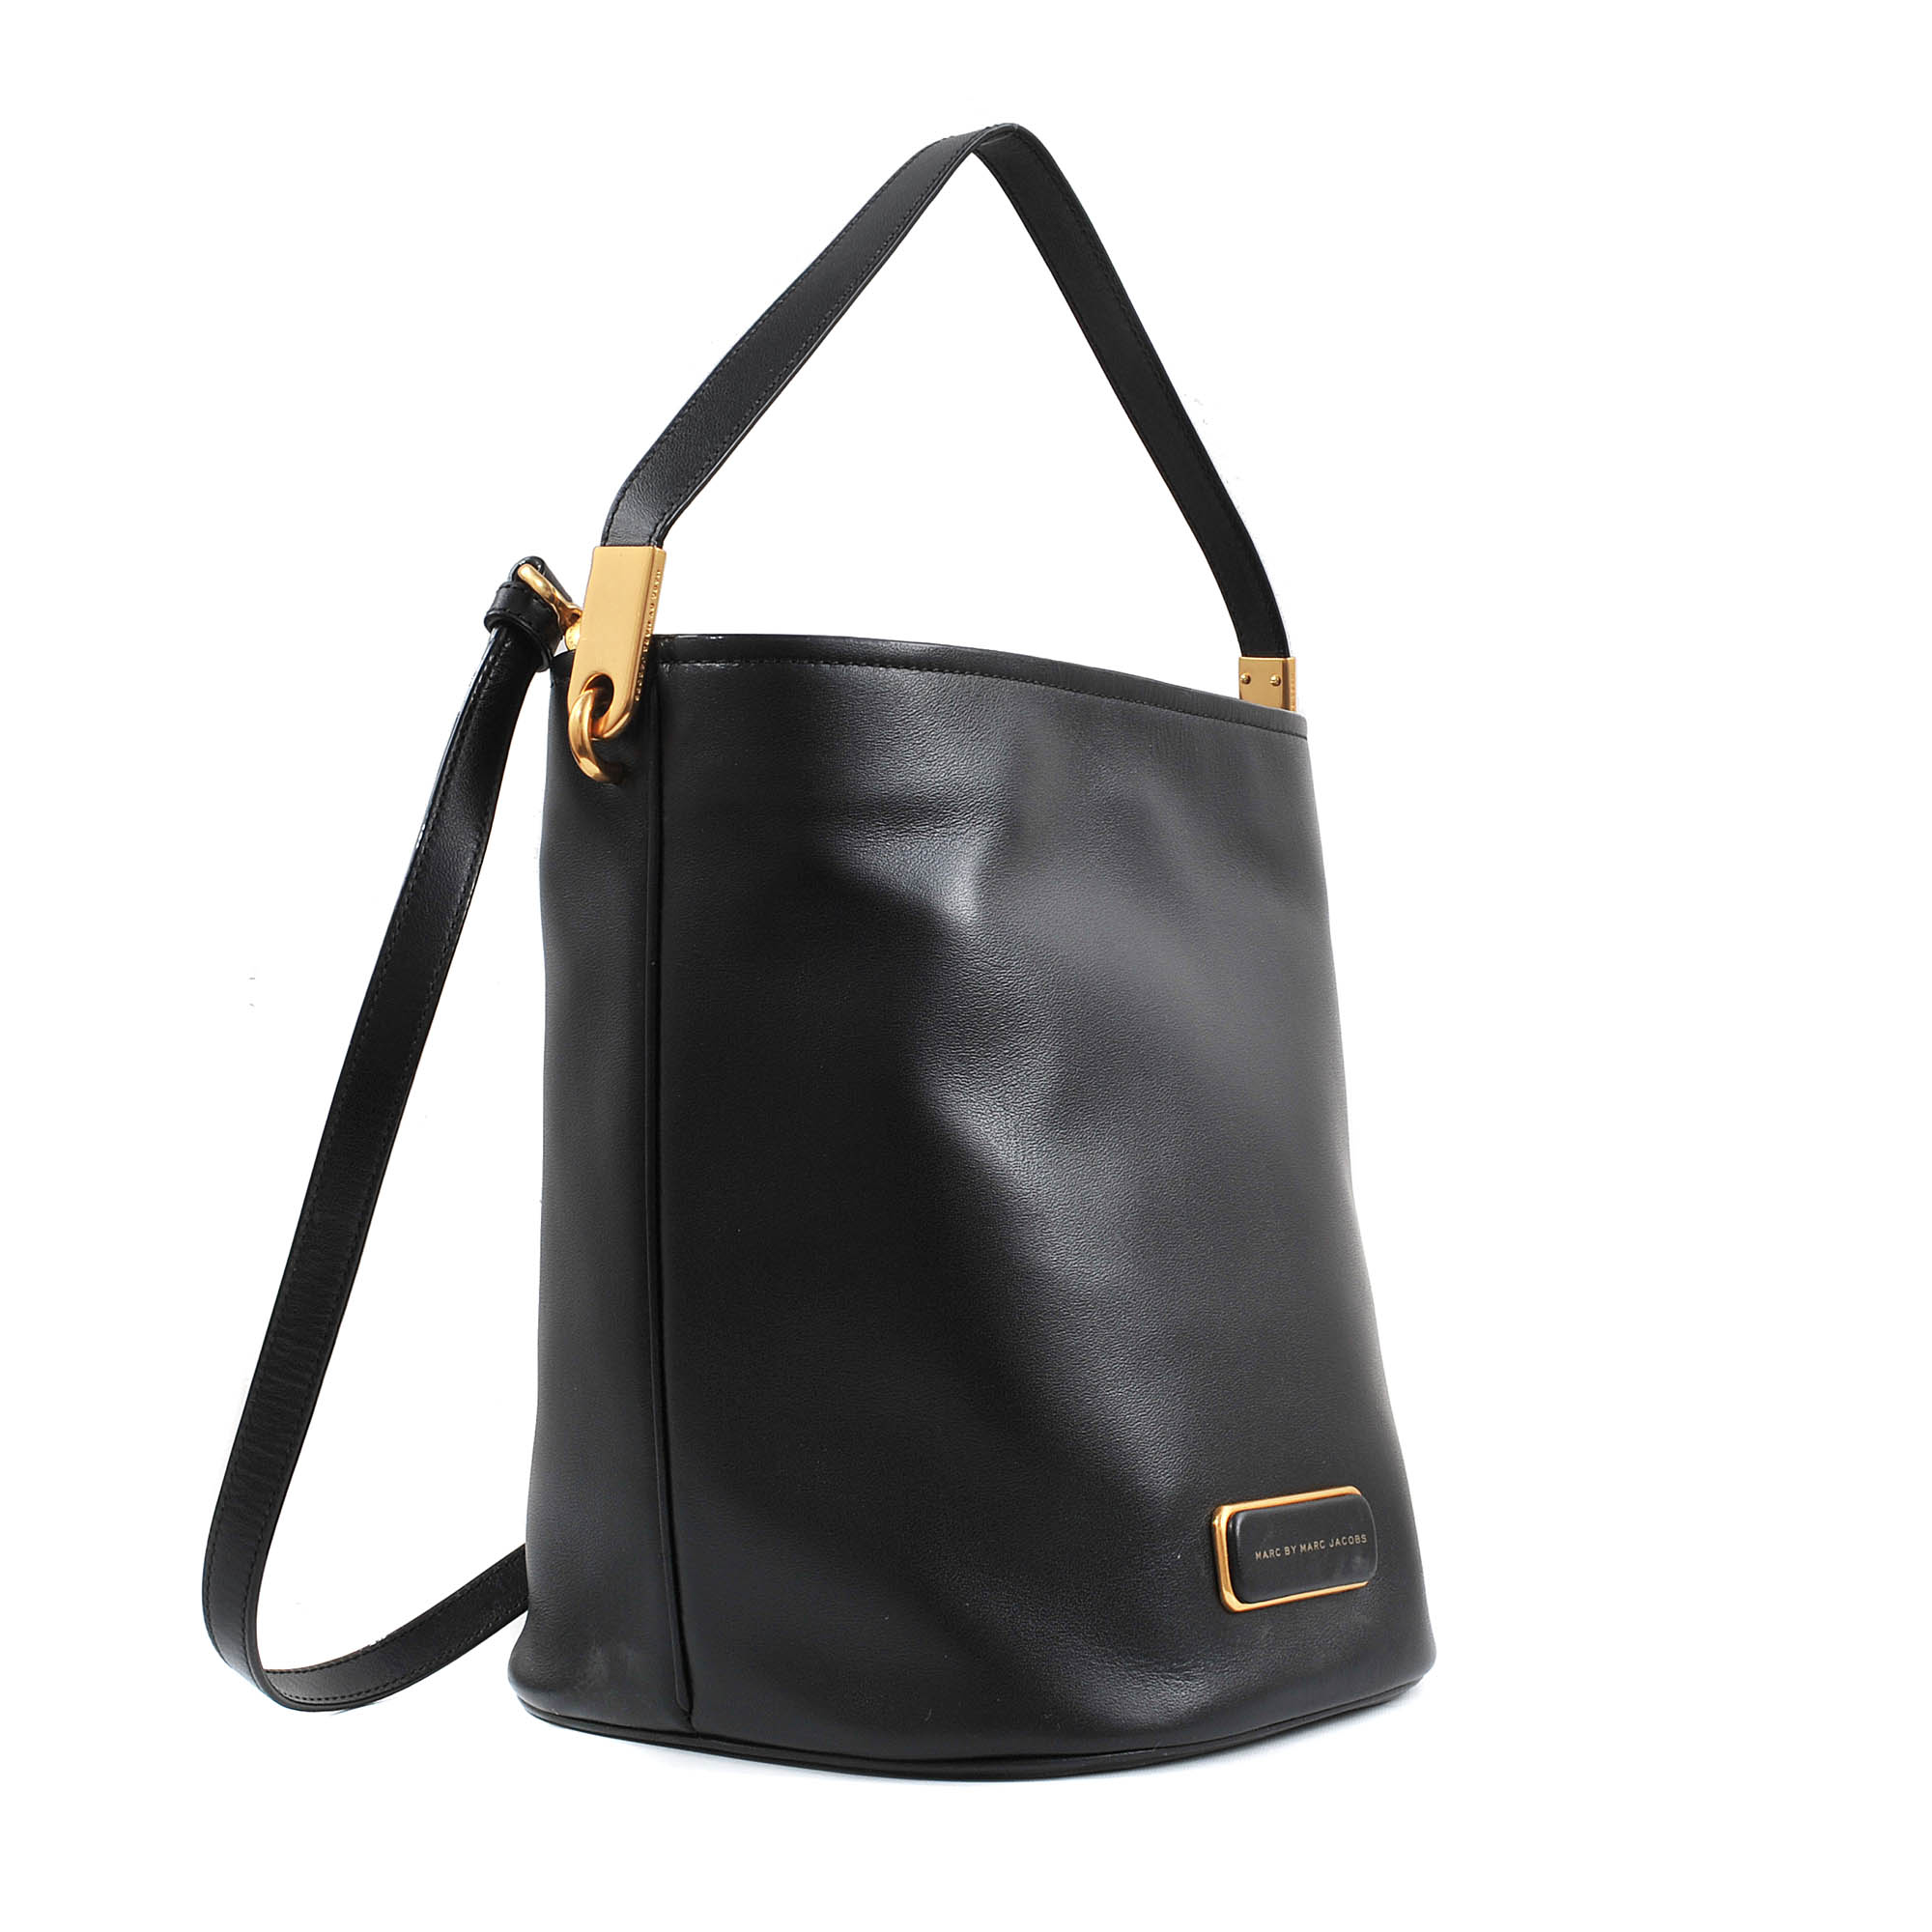 a2d781652687 Marc By Marc Jacobs Ligero Bucket Bag in Black - Lyst